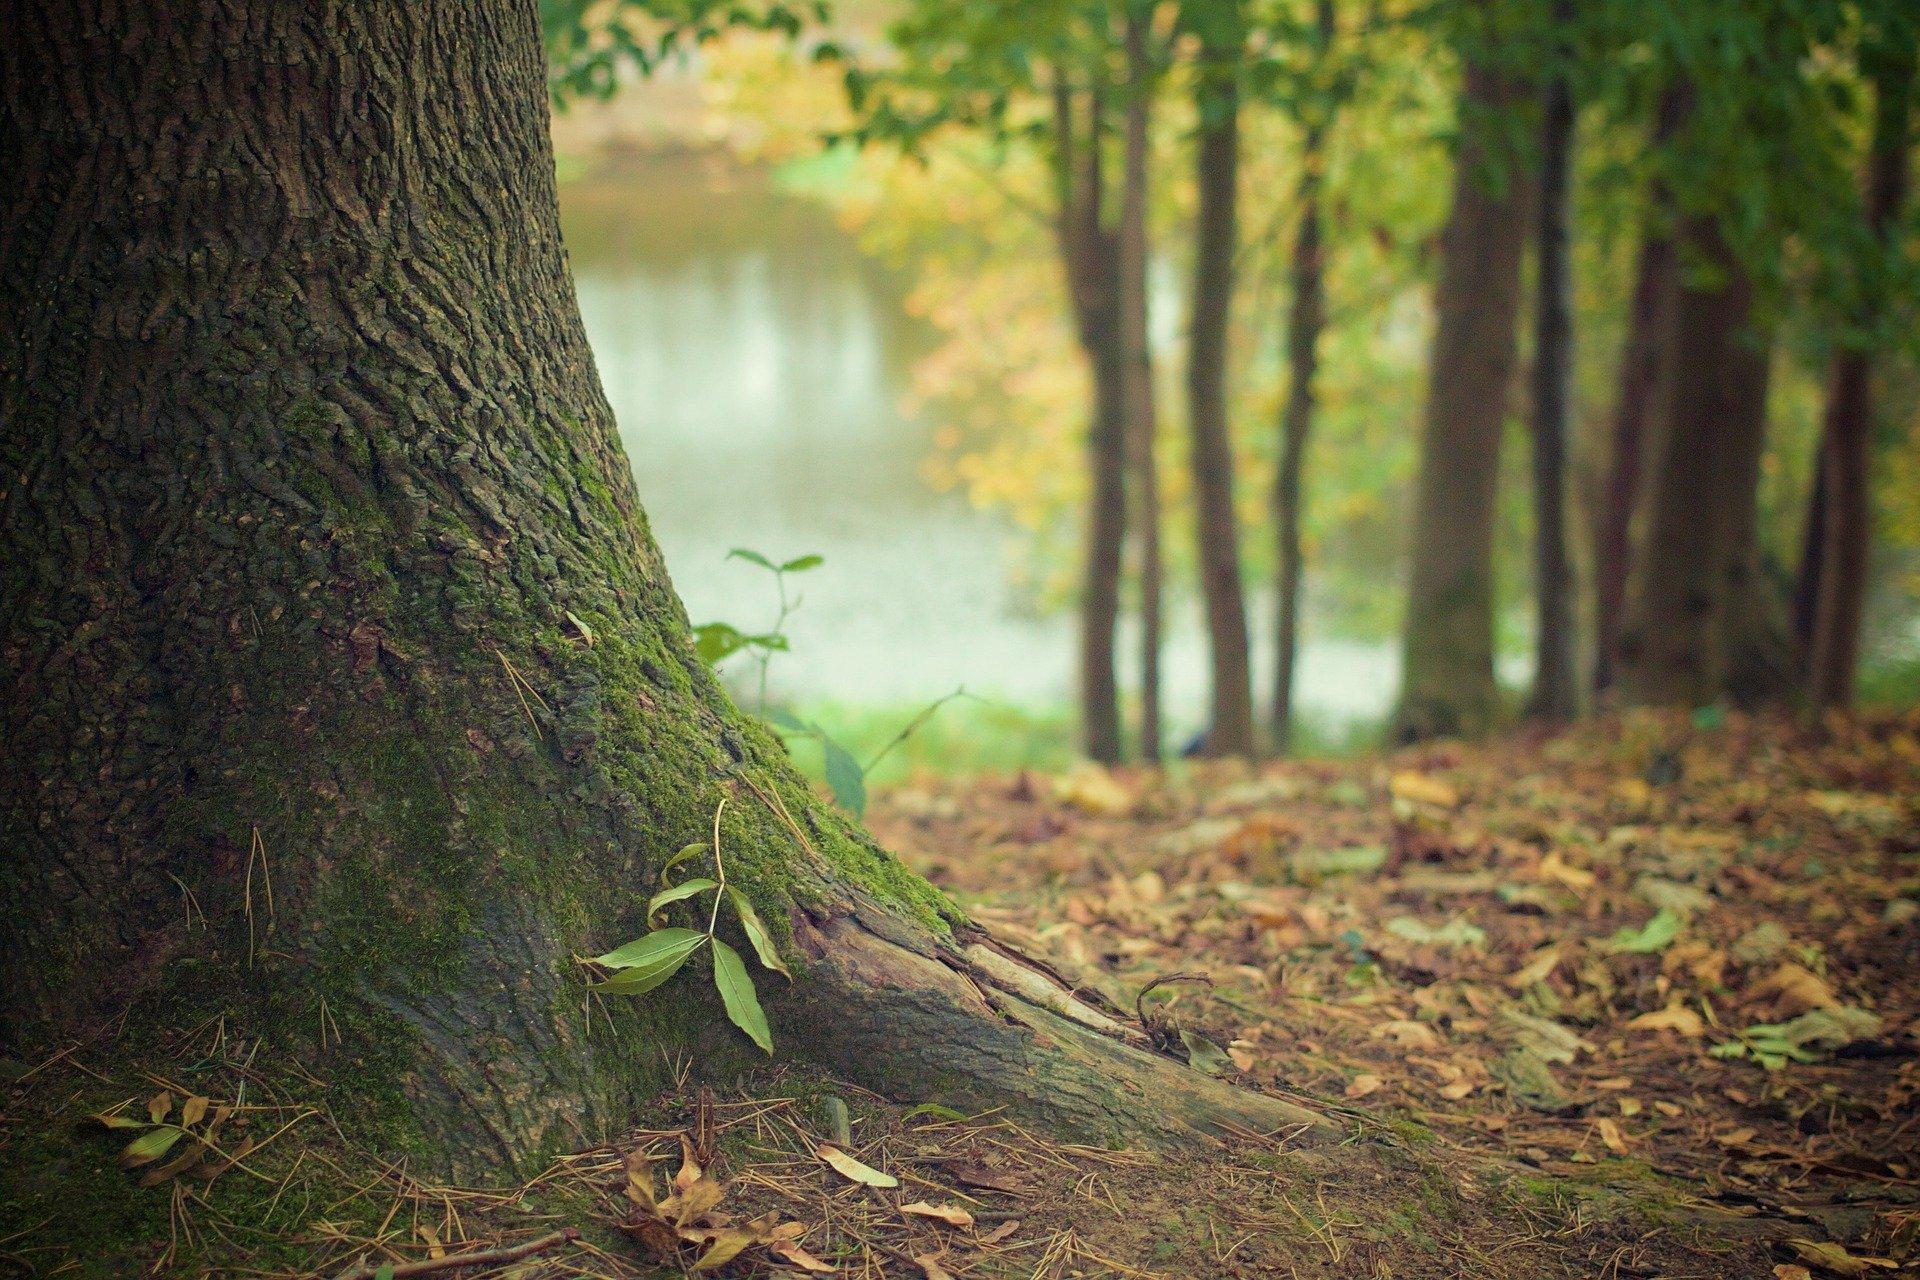 Avventure tra i boschi